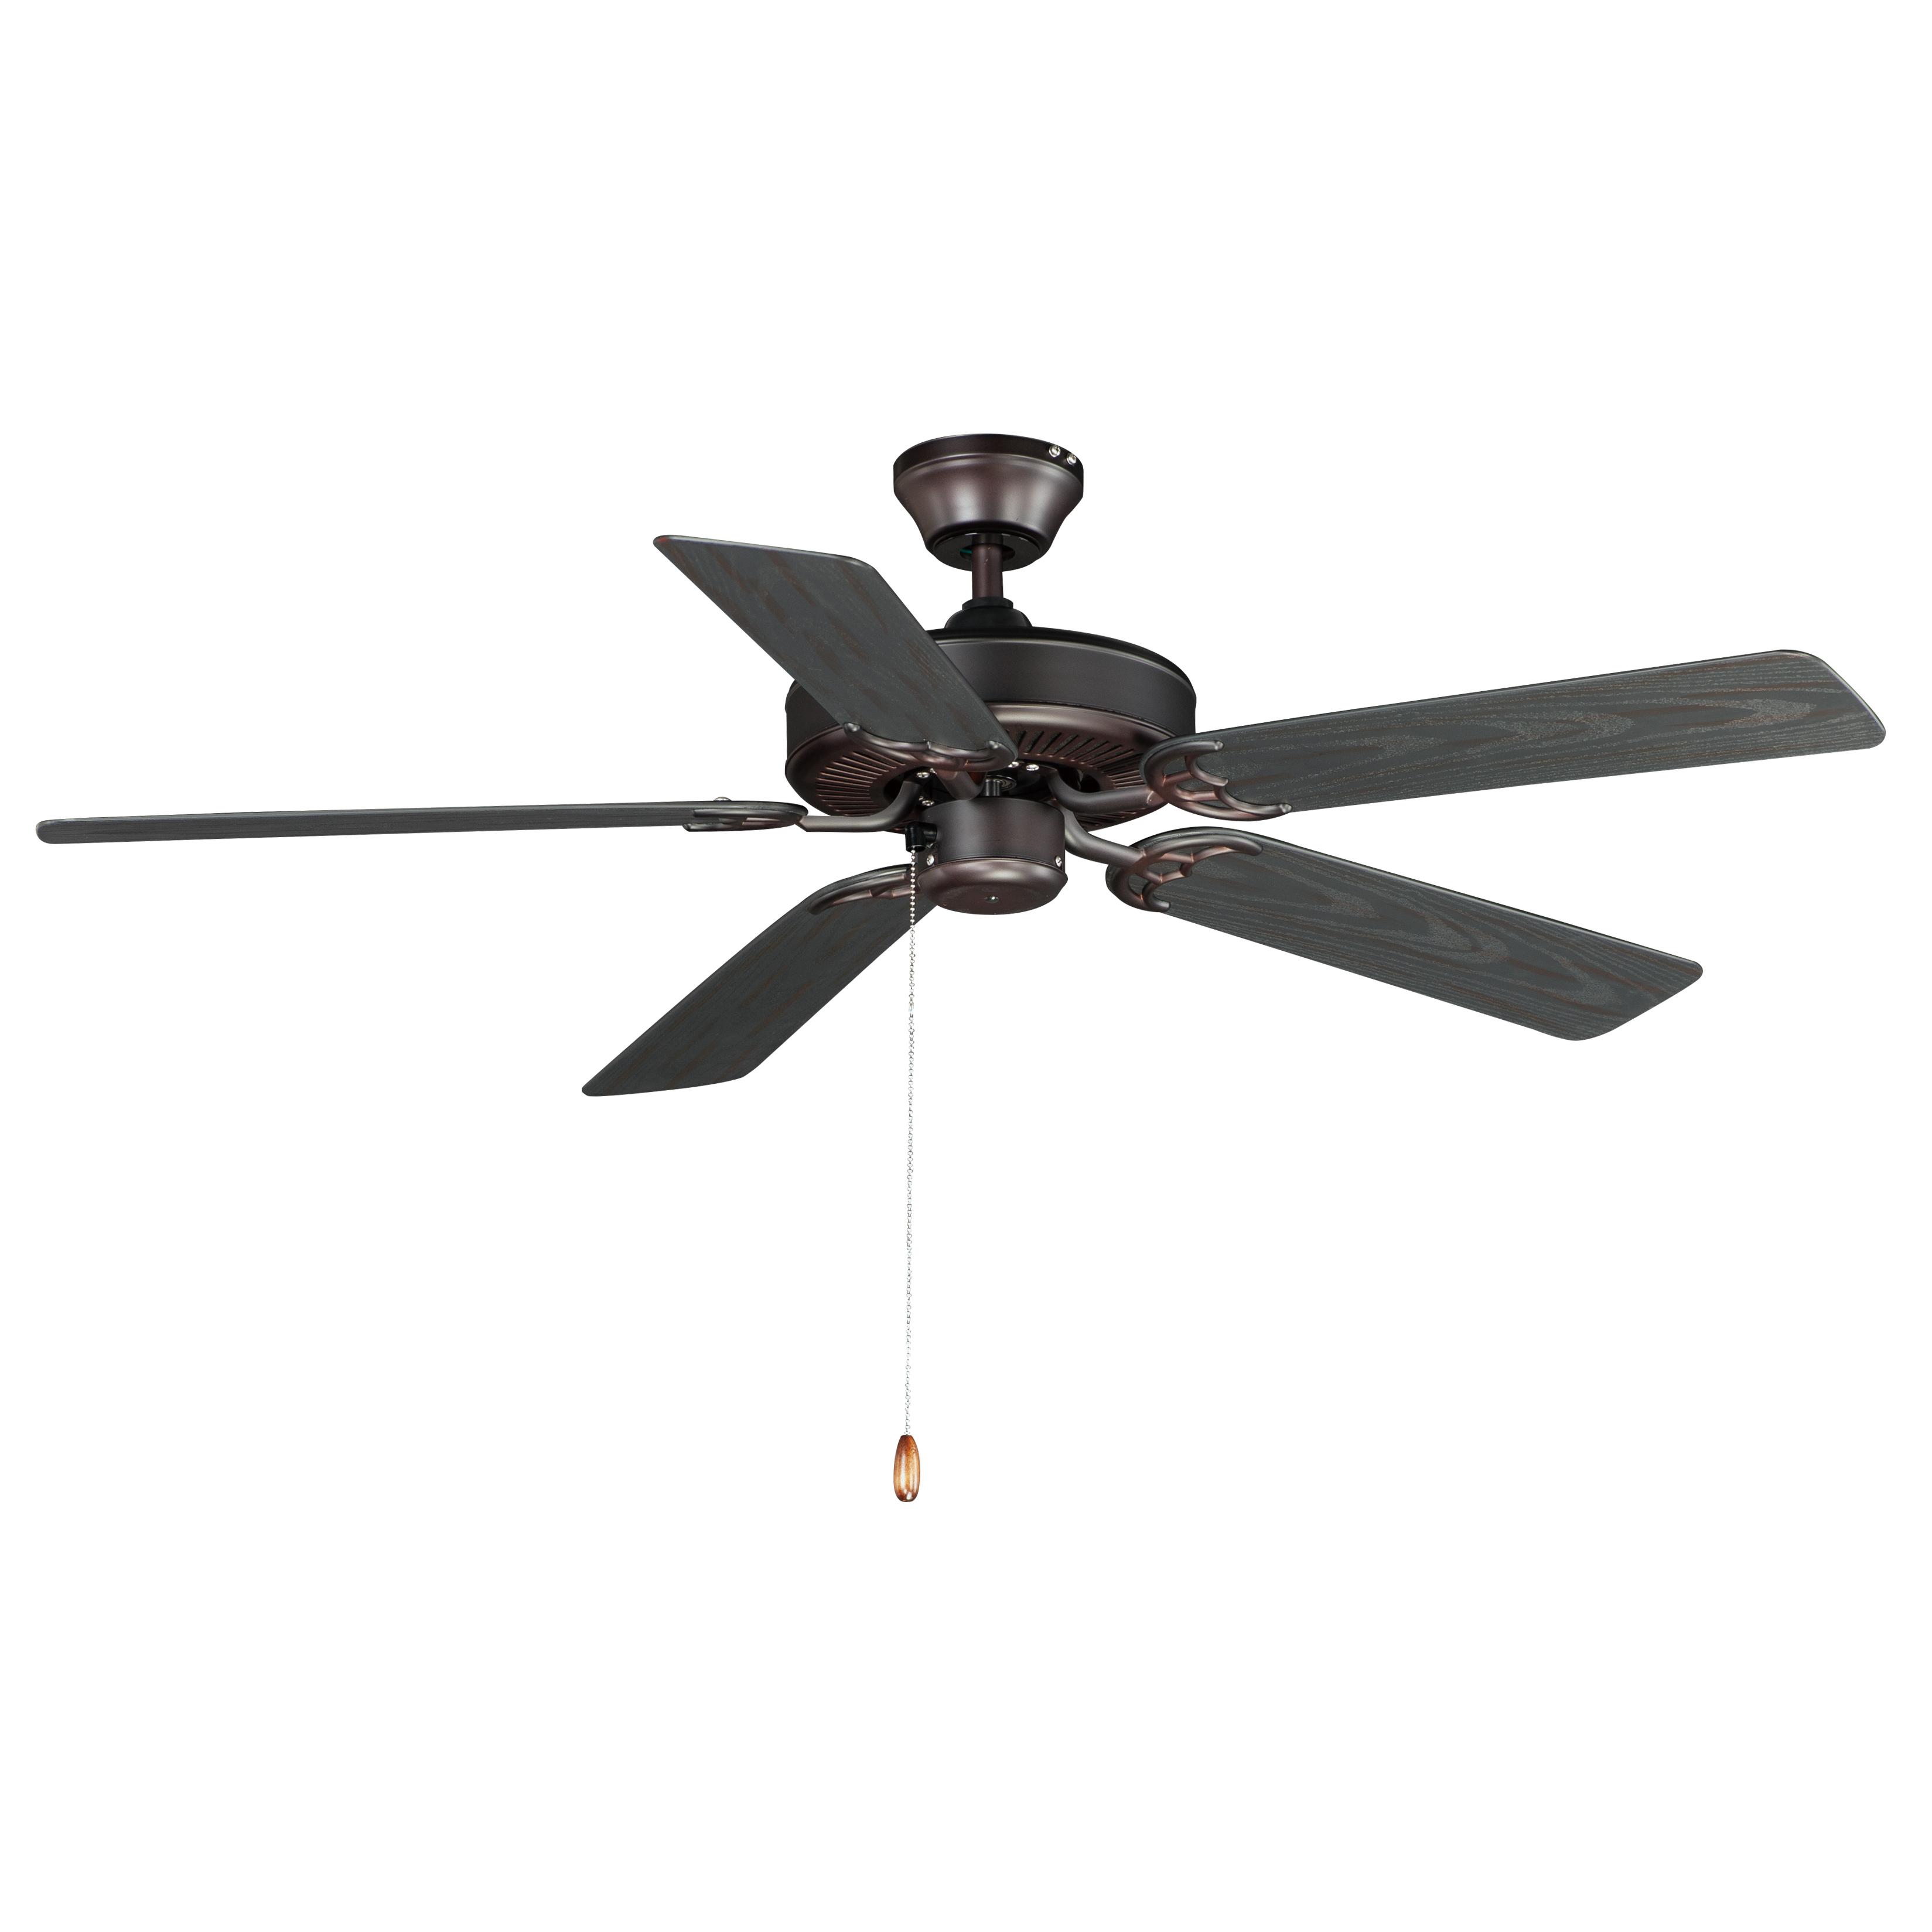 Basic-Max 52-inch Outdoor Ceiling Fan | Maxim Lighting